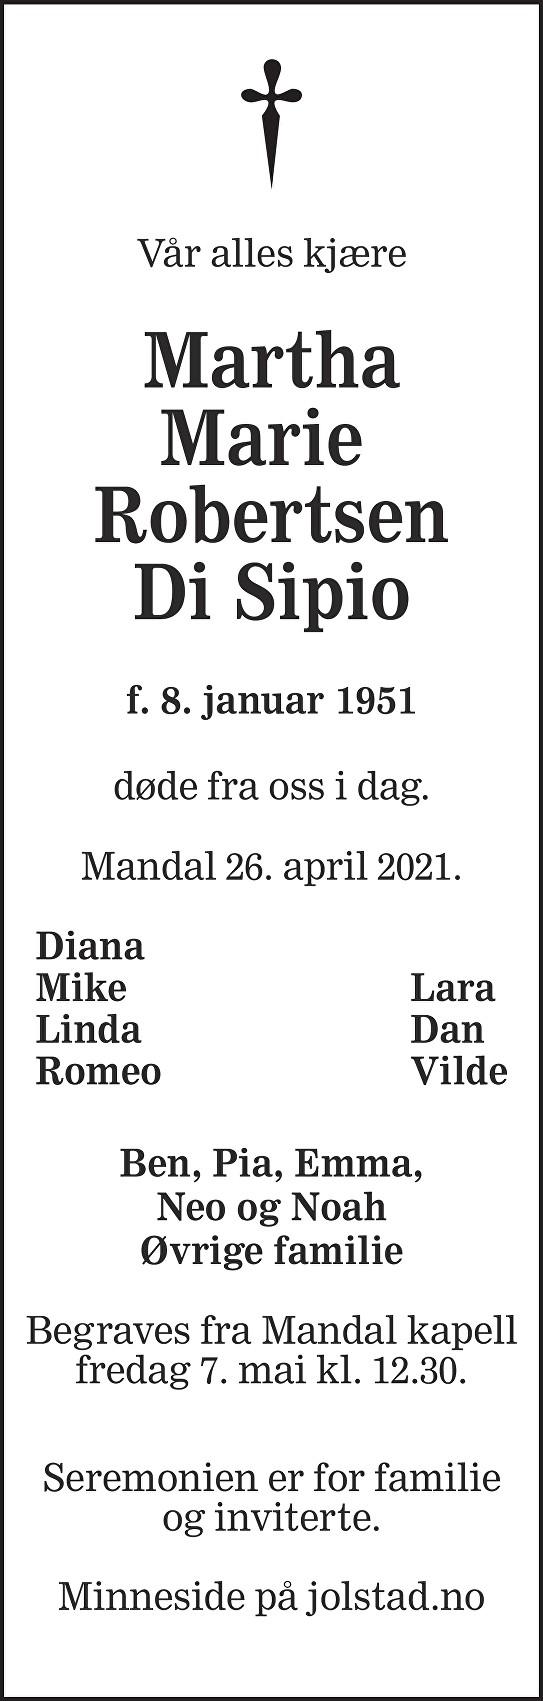 Martha Marie Robertsen Di Sipio Dødsannonse